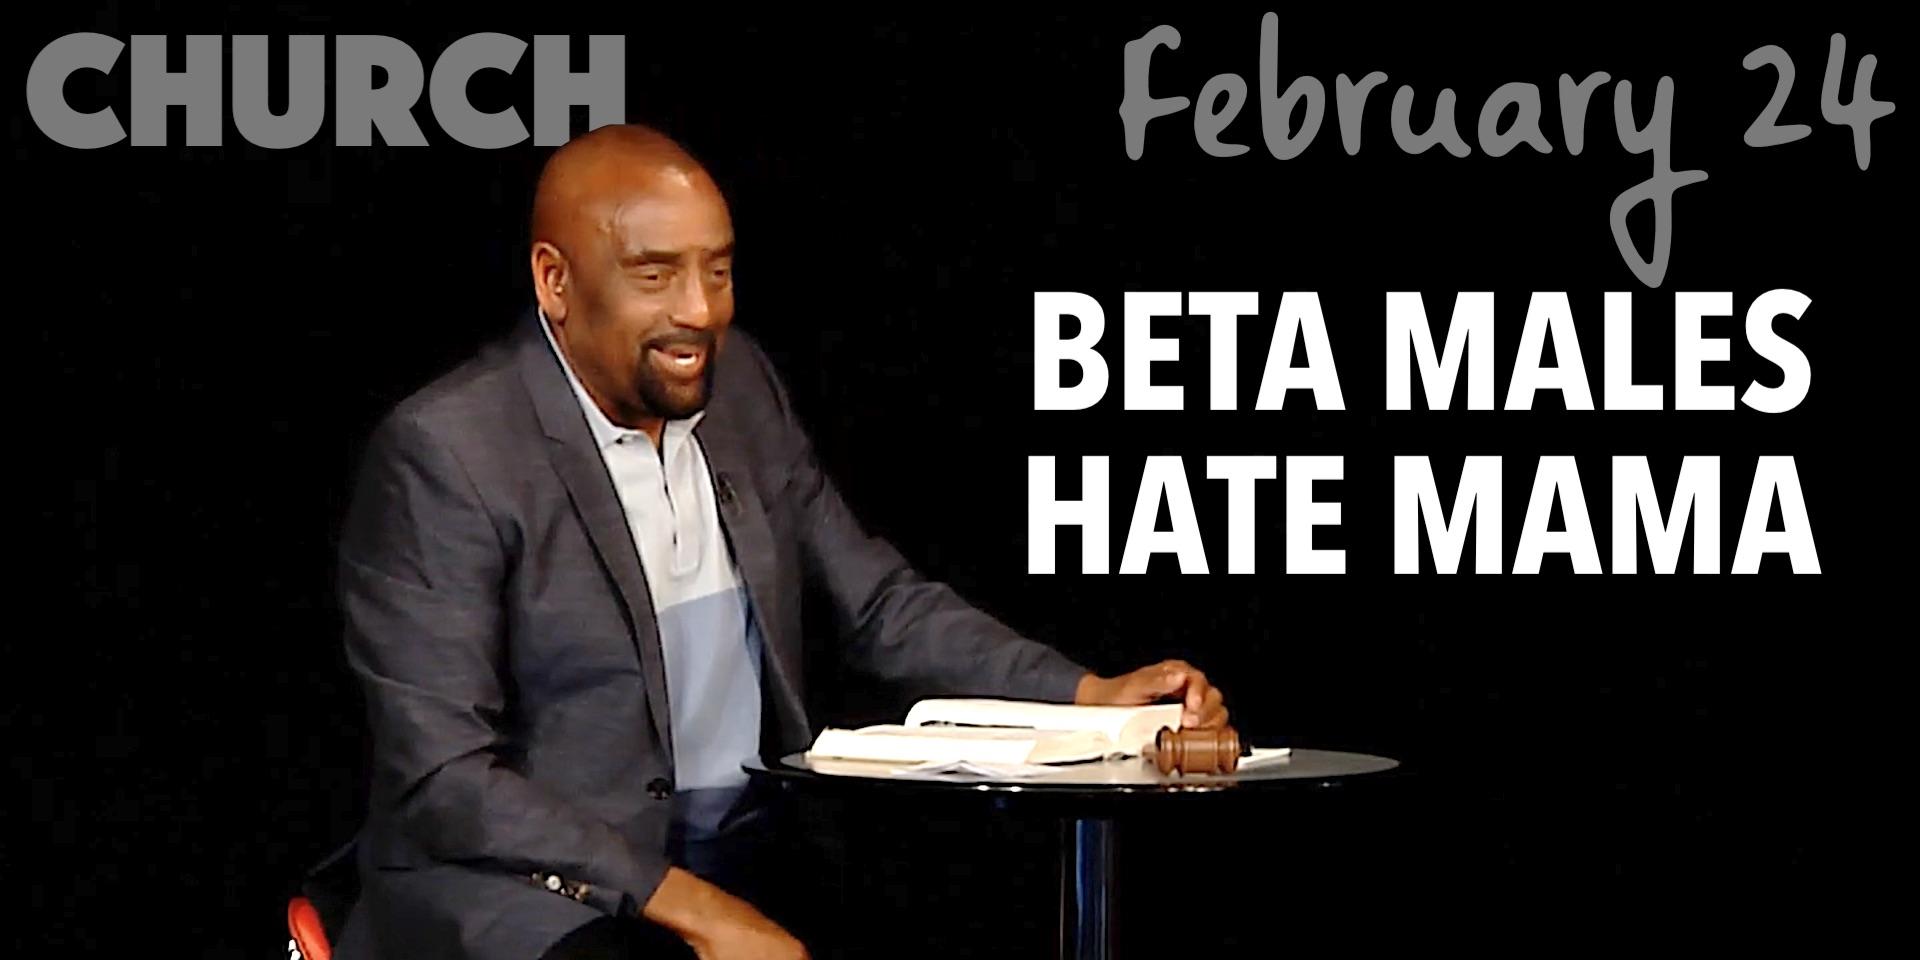 CHURCH Feb 24, 2019: Beta Males Hate Mama